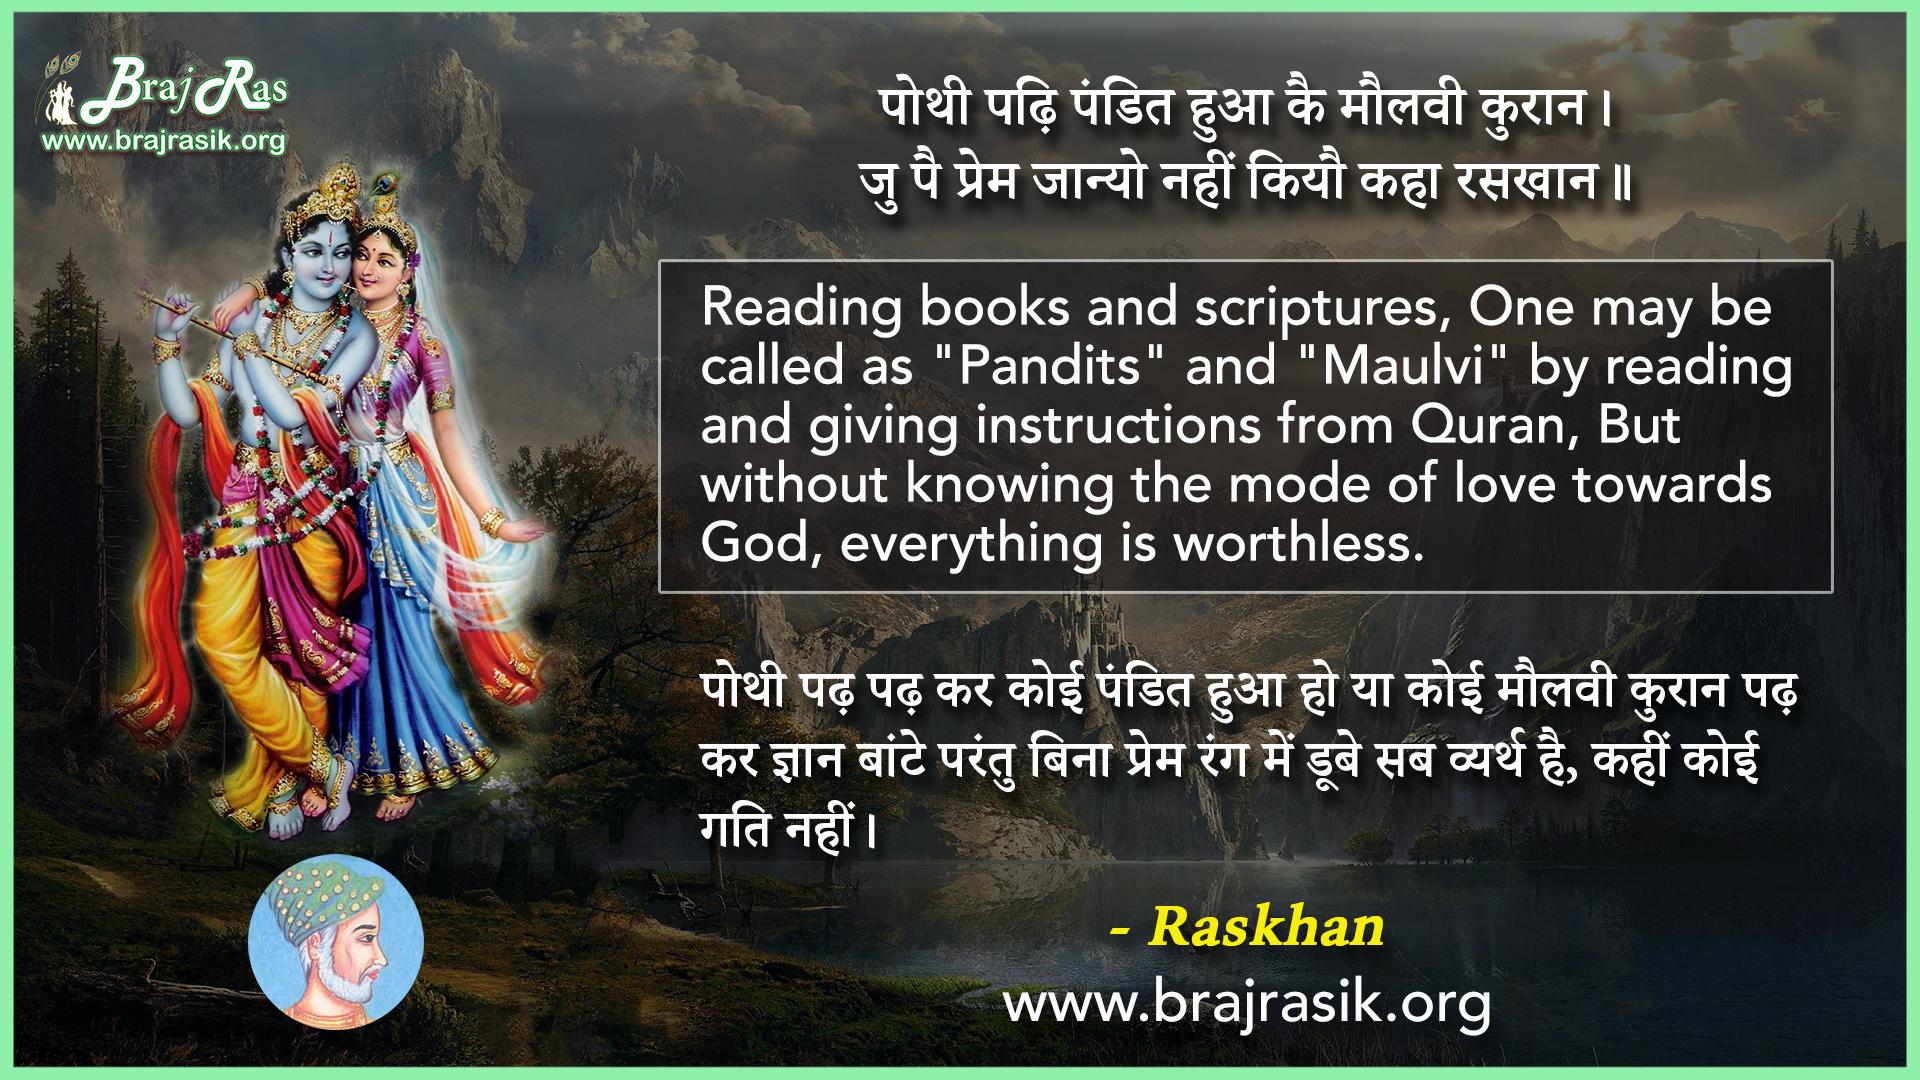 Pothi Padhi Pandit Hua Kai Maulavi Kuran - Raskhan